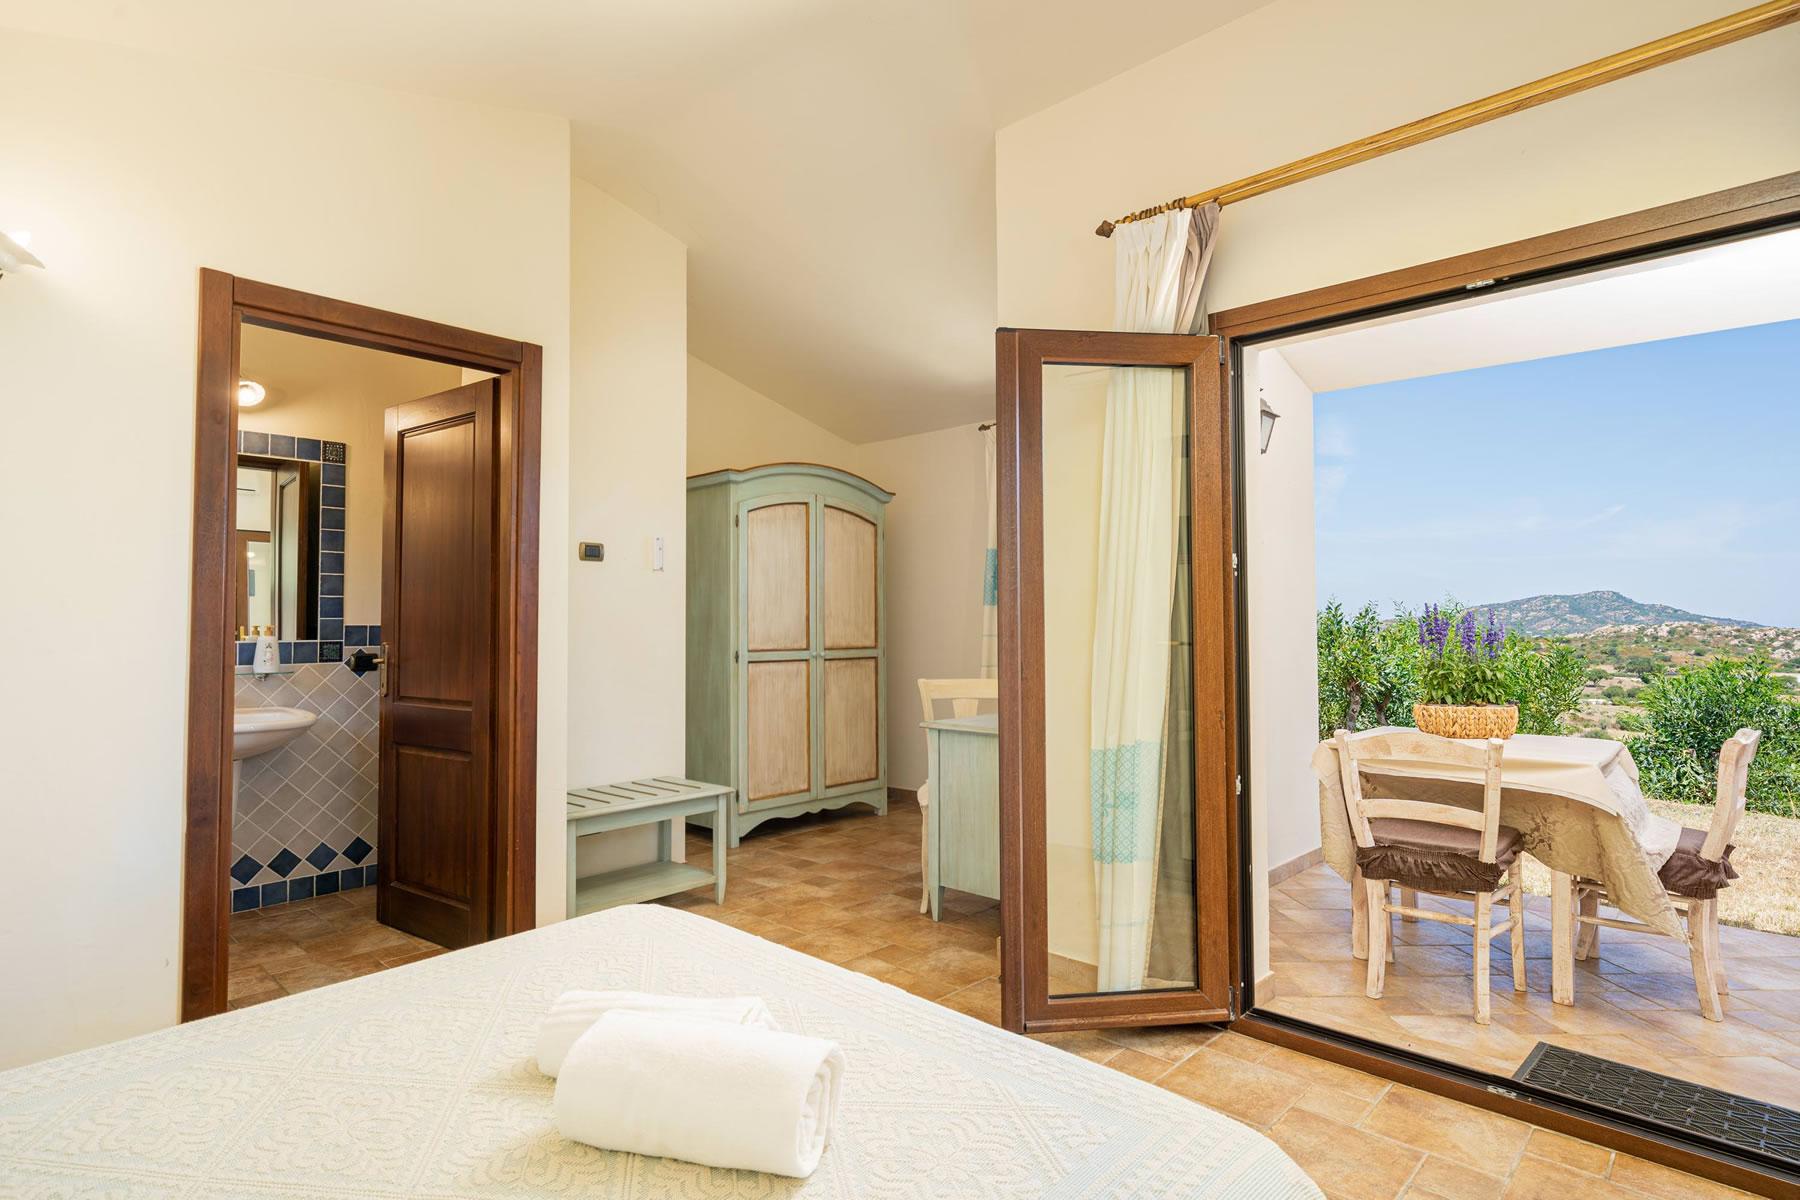 borgo-alba-barona-hotel-golfo-aranci-GS201055